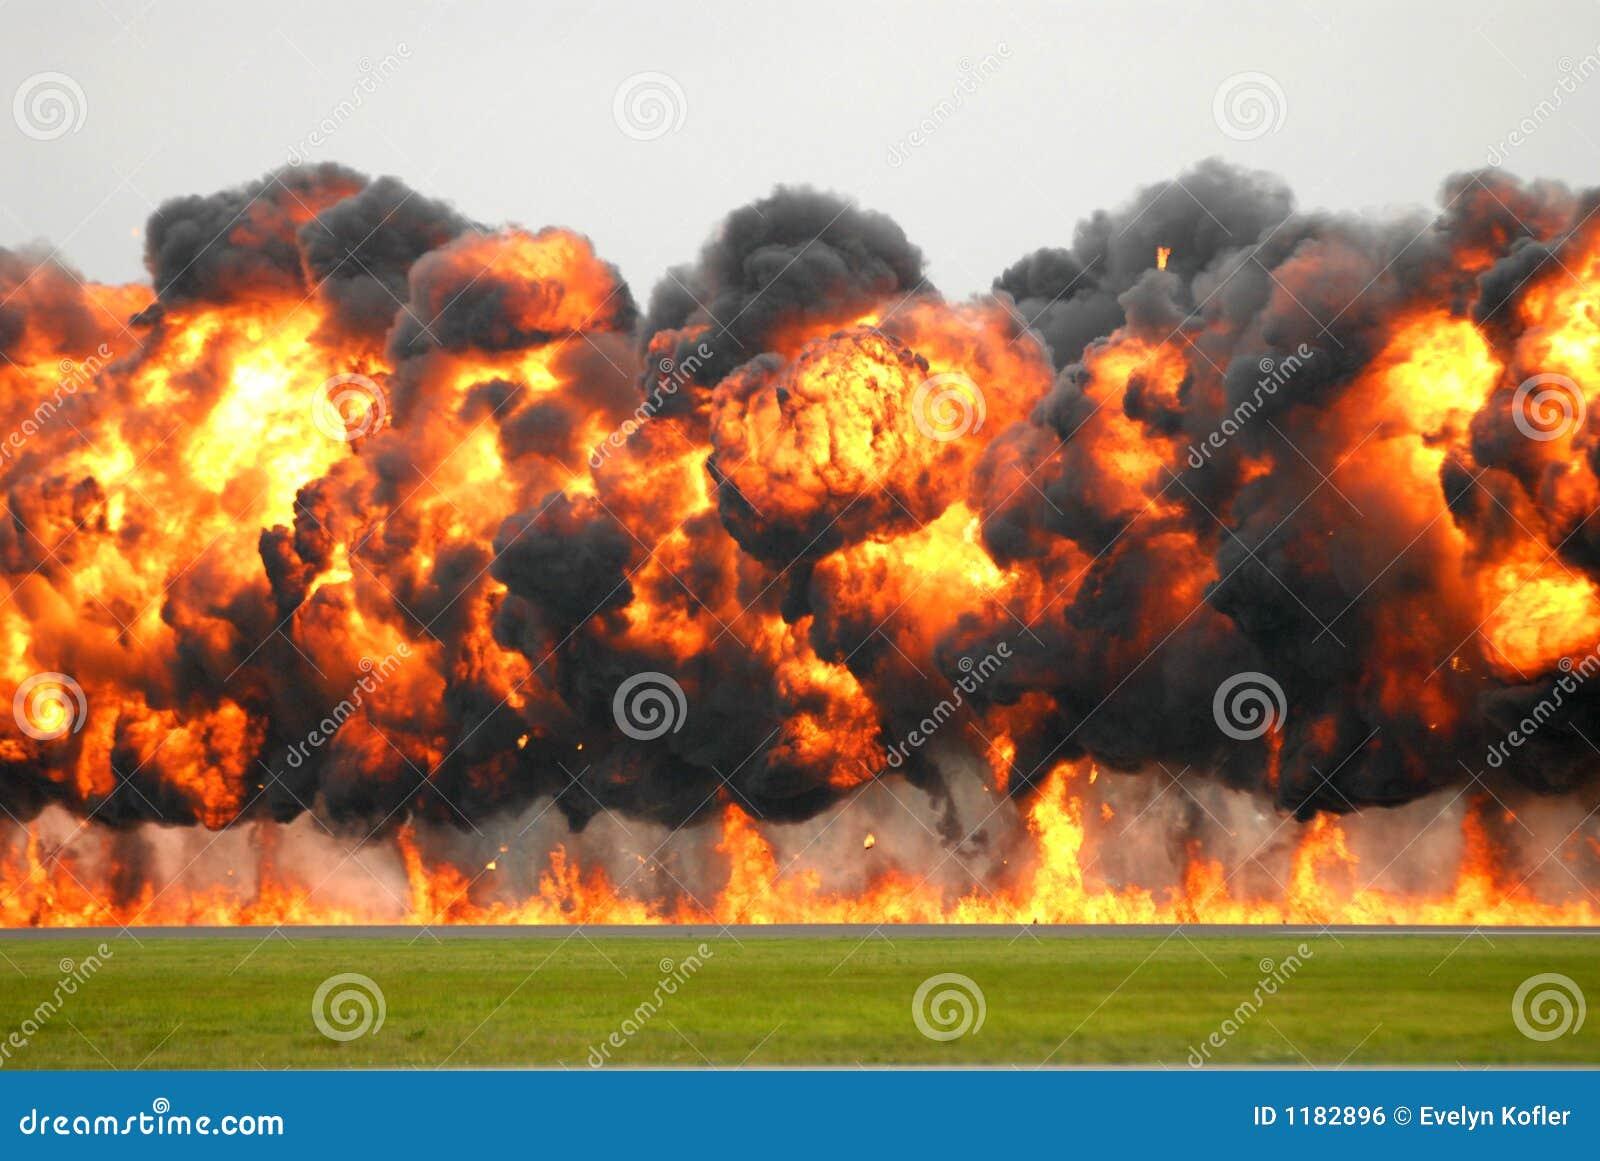 2 eksplozję